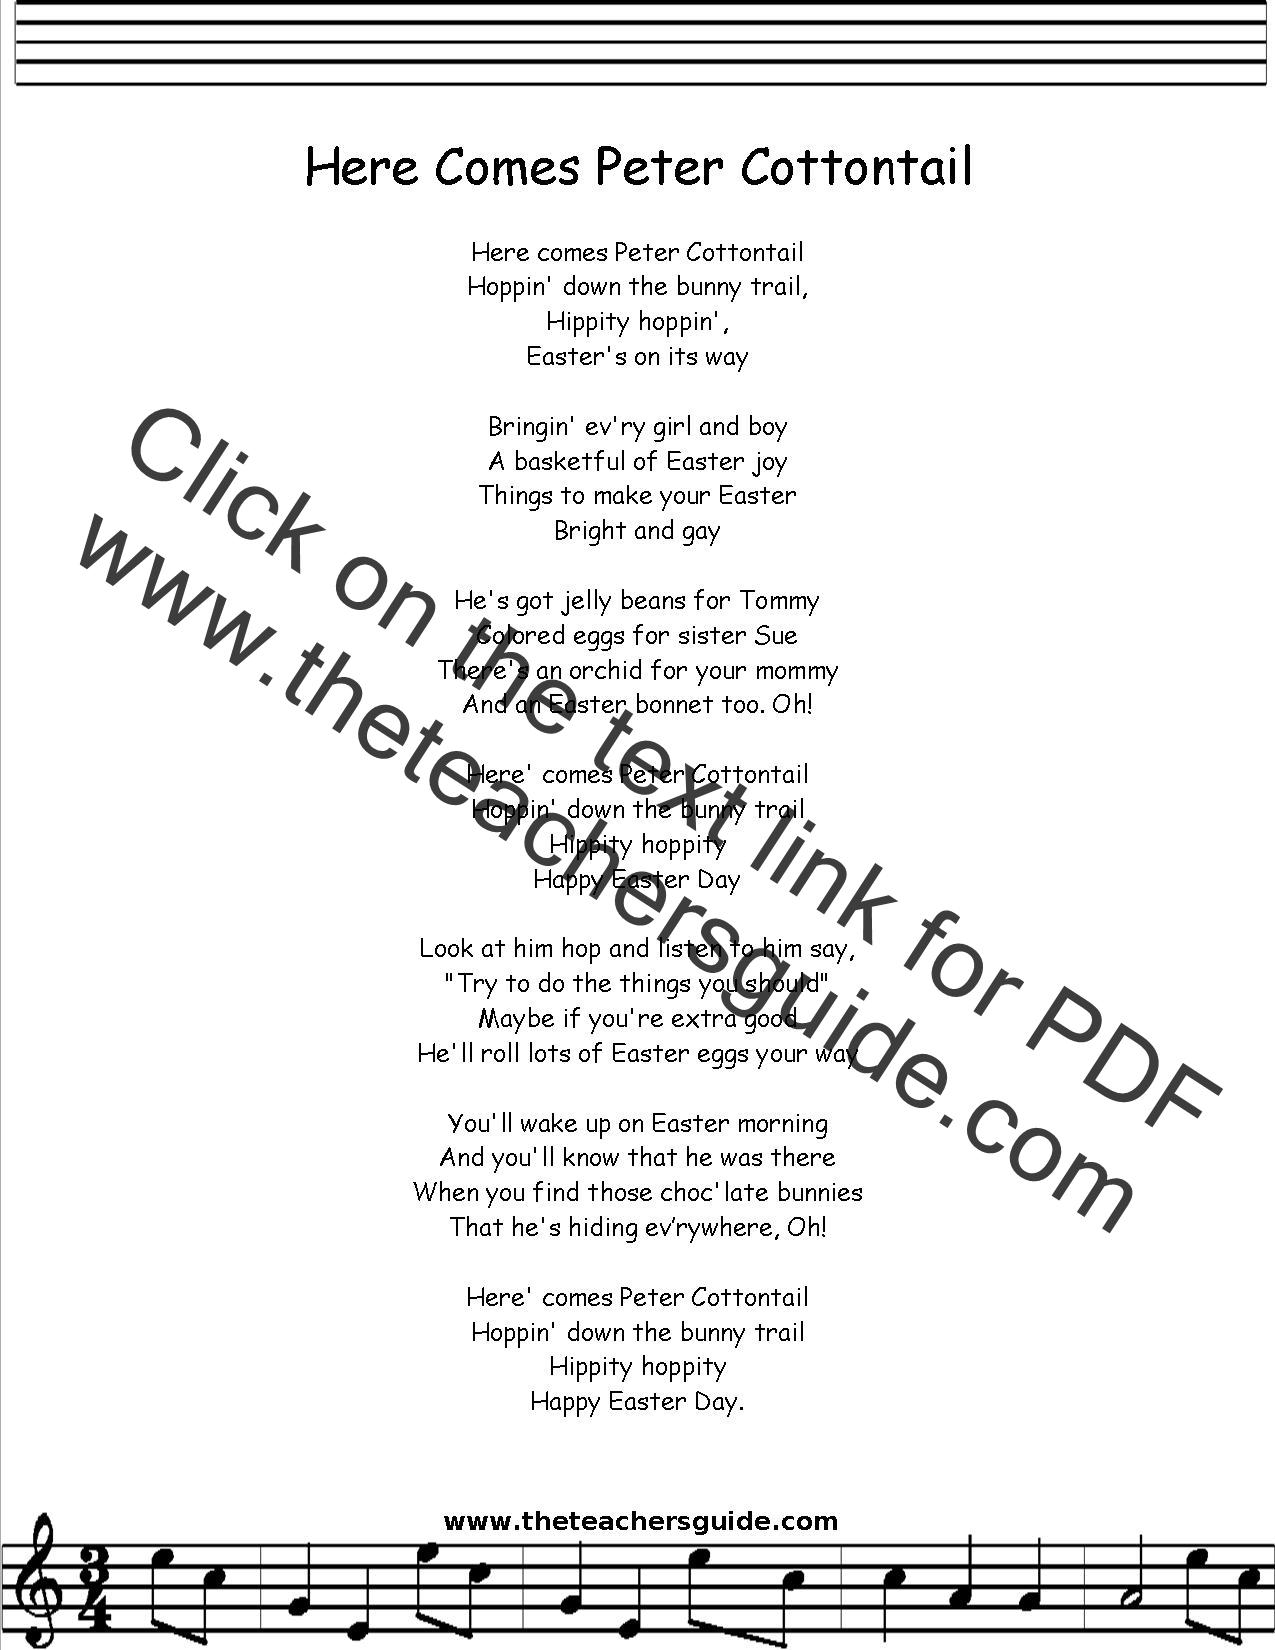 Peter Cottontail Lyrics Printout Midi And Video